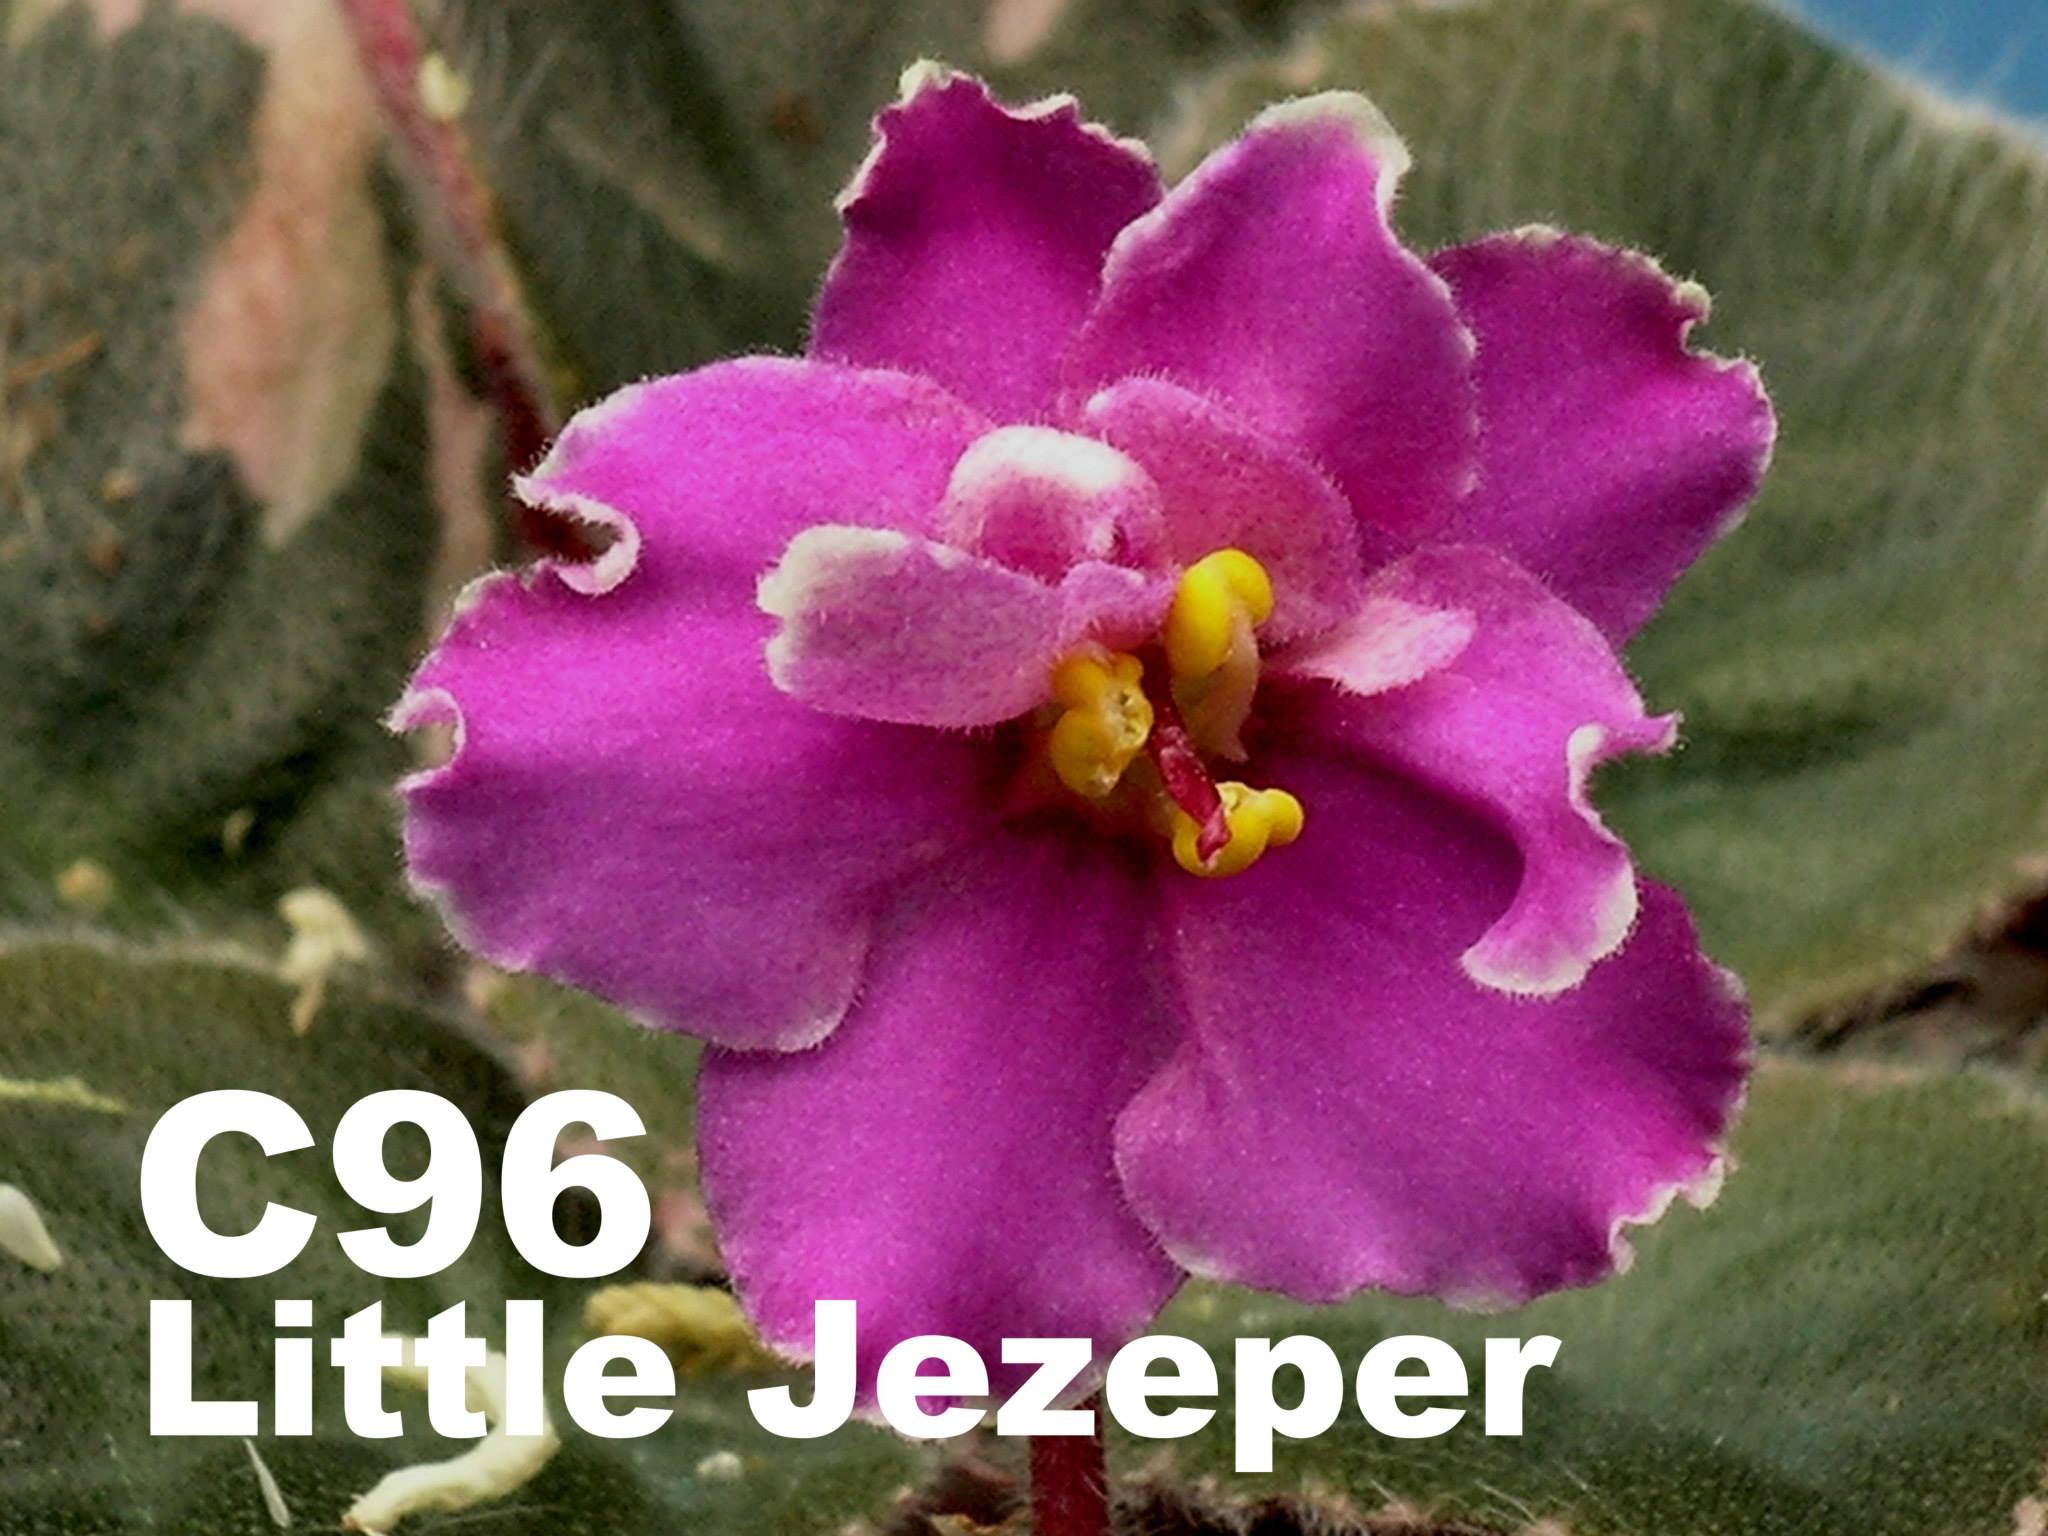 [C96] Little Jezeper C96